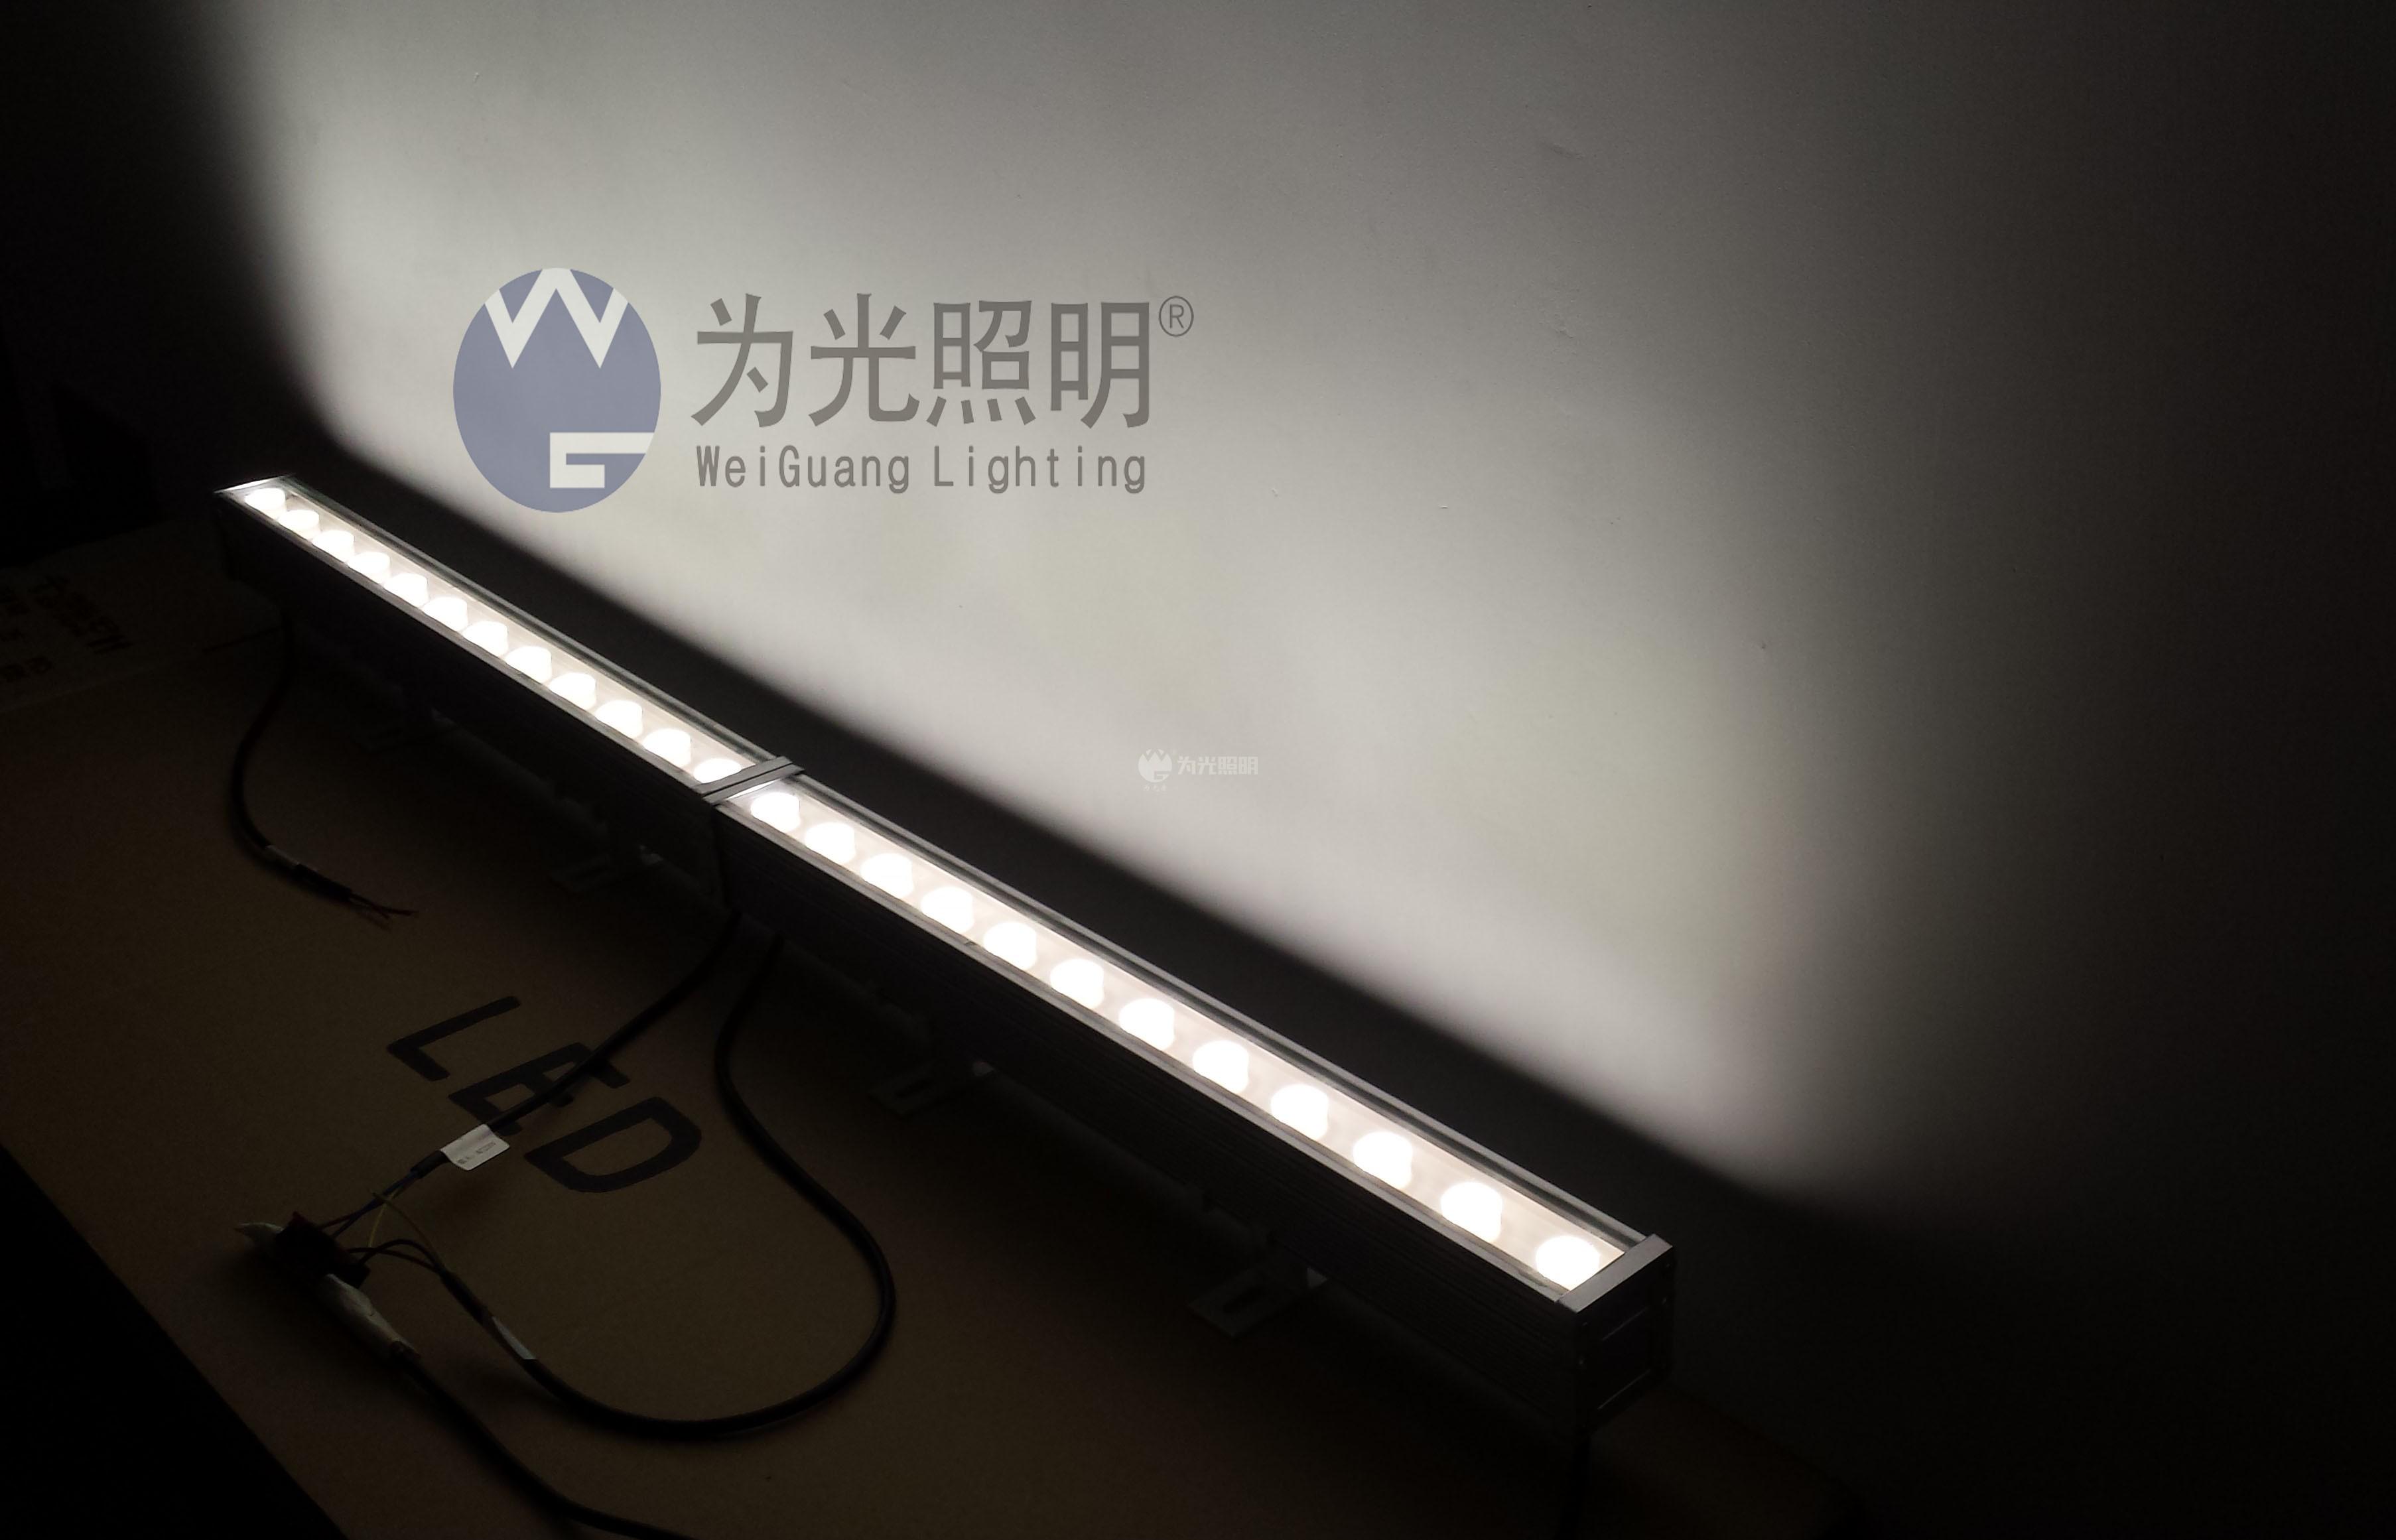 广东LED户外灯具厂家|LED瓦片灯|LED瓦楞灯|LEDbob体育app官方网站|LED洗墙灯|LED窗台灯|LED线条灯|LED地埋灯